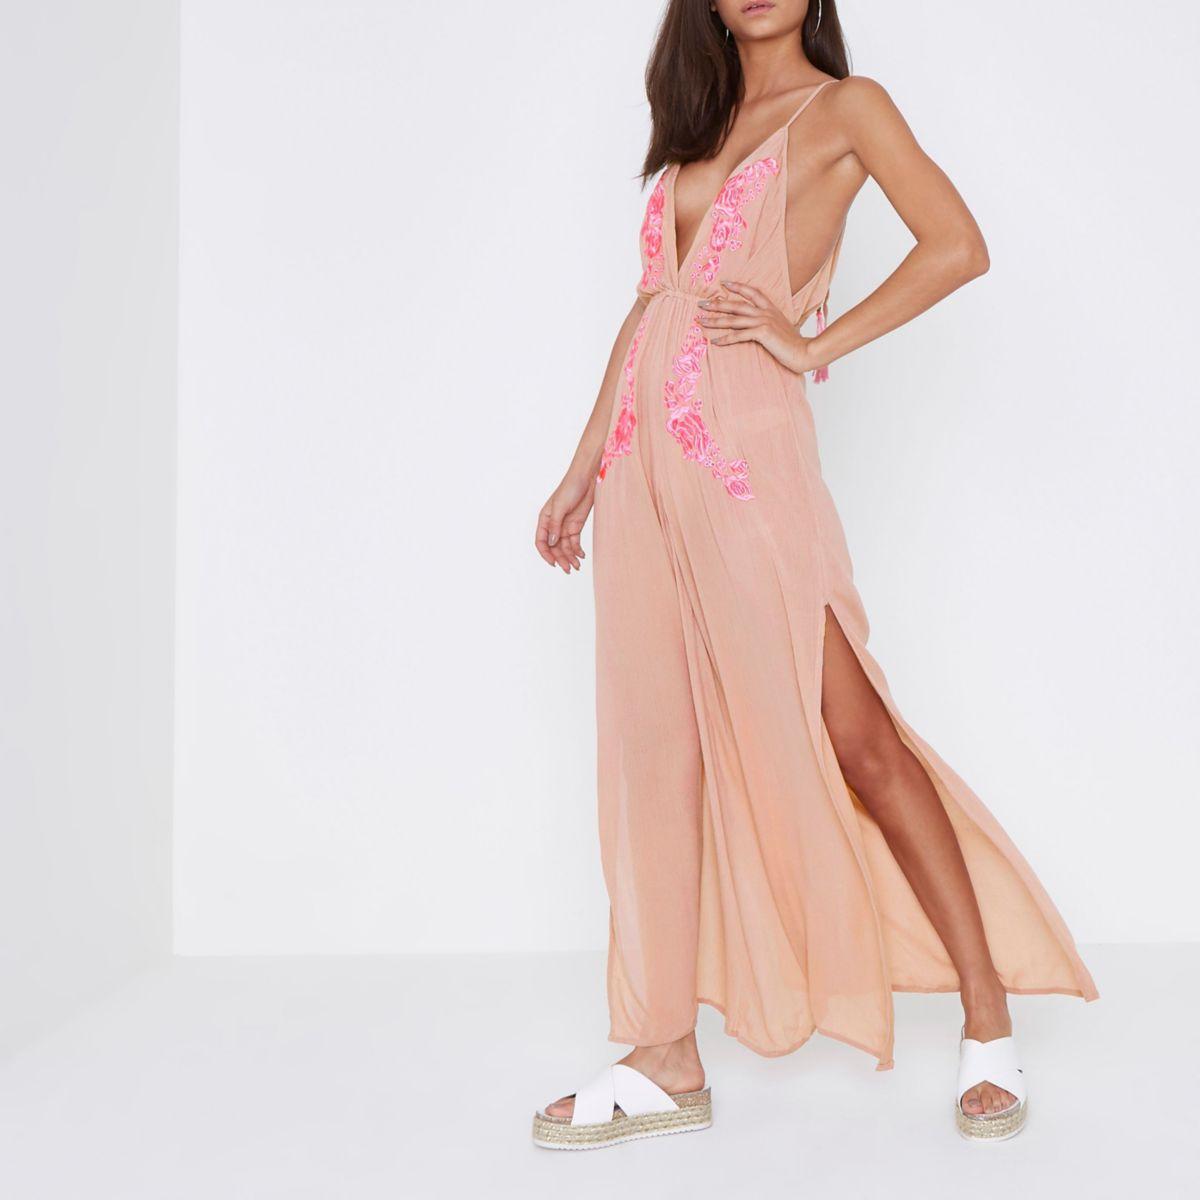 Roze strandjumpsuit met lichtroze borduursel